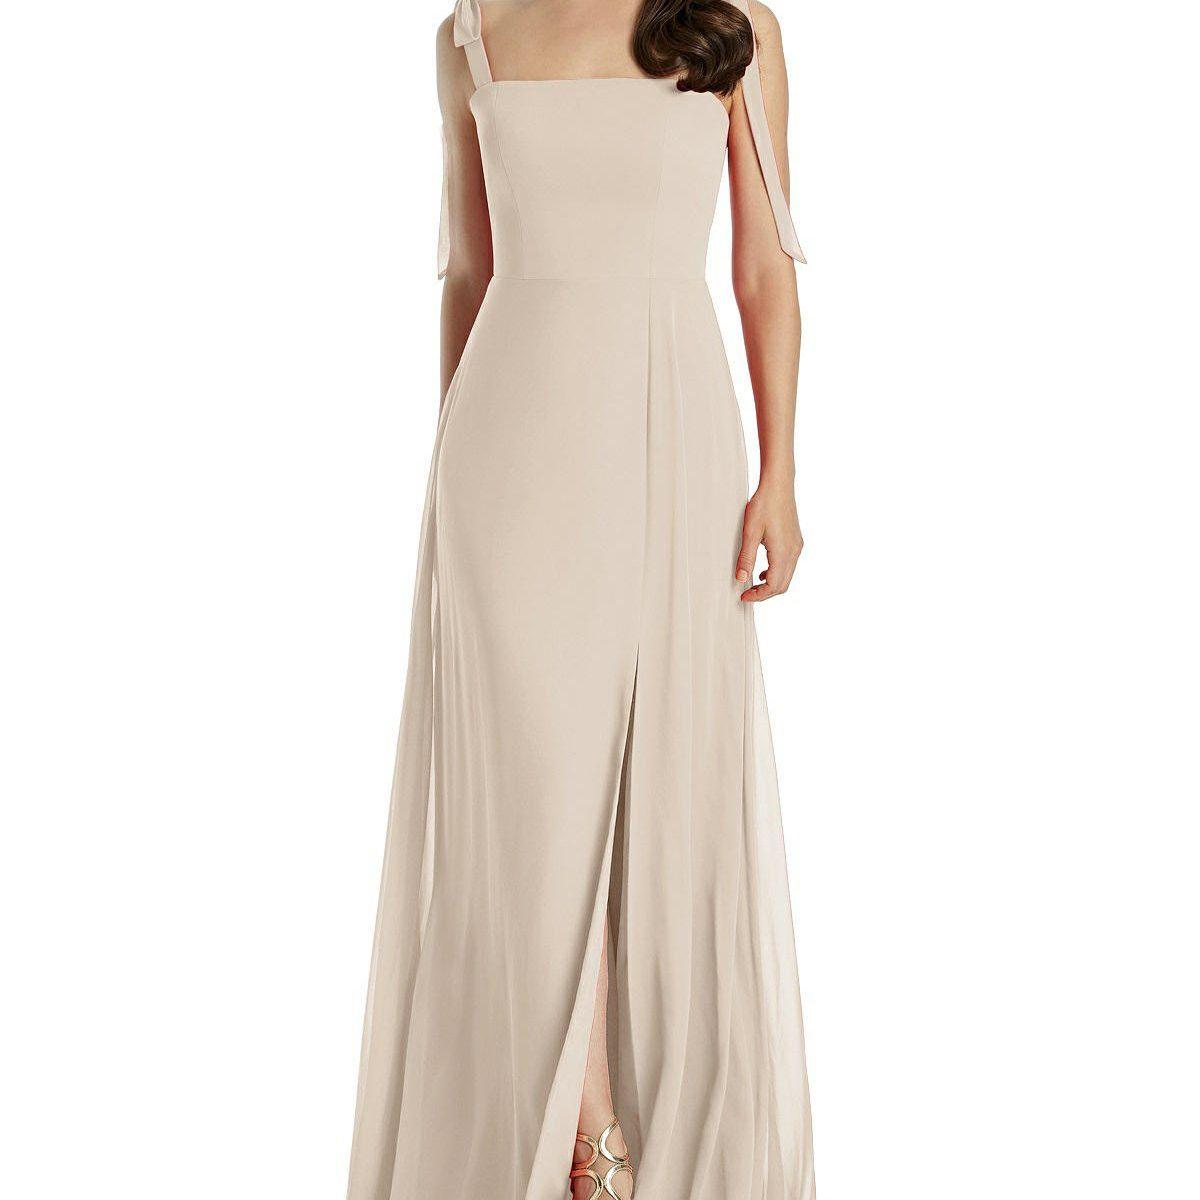 25 Beige Bridesmaid Dresses To Flatter Everyone